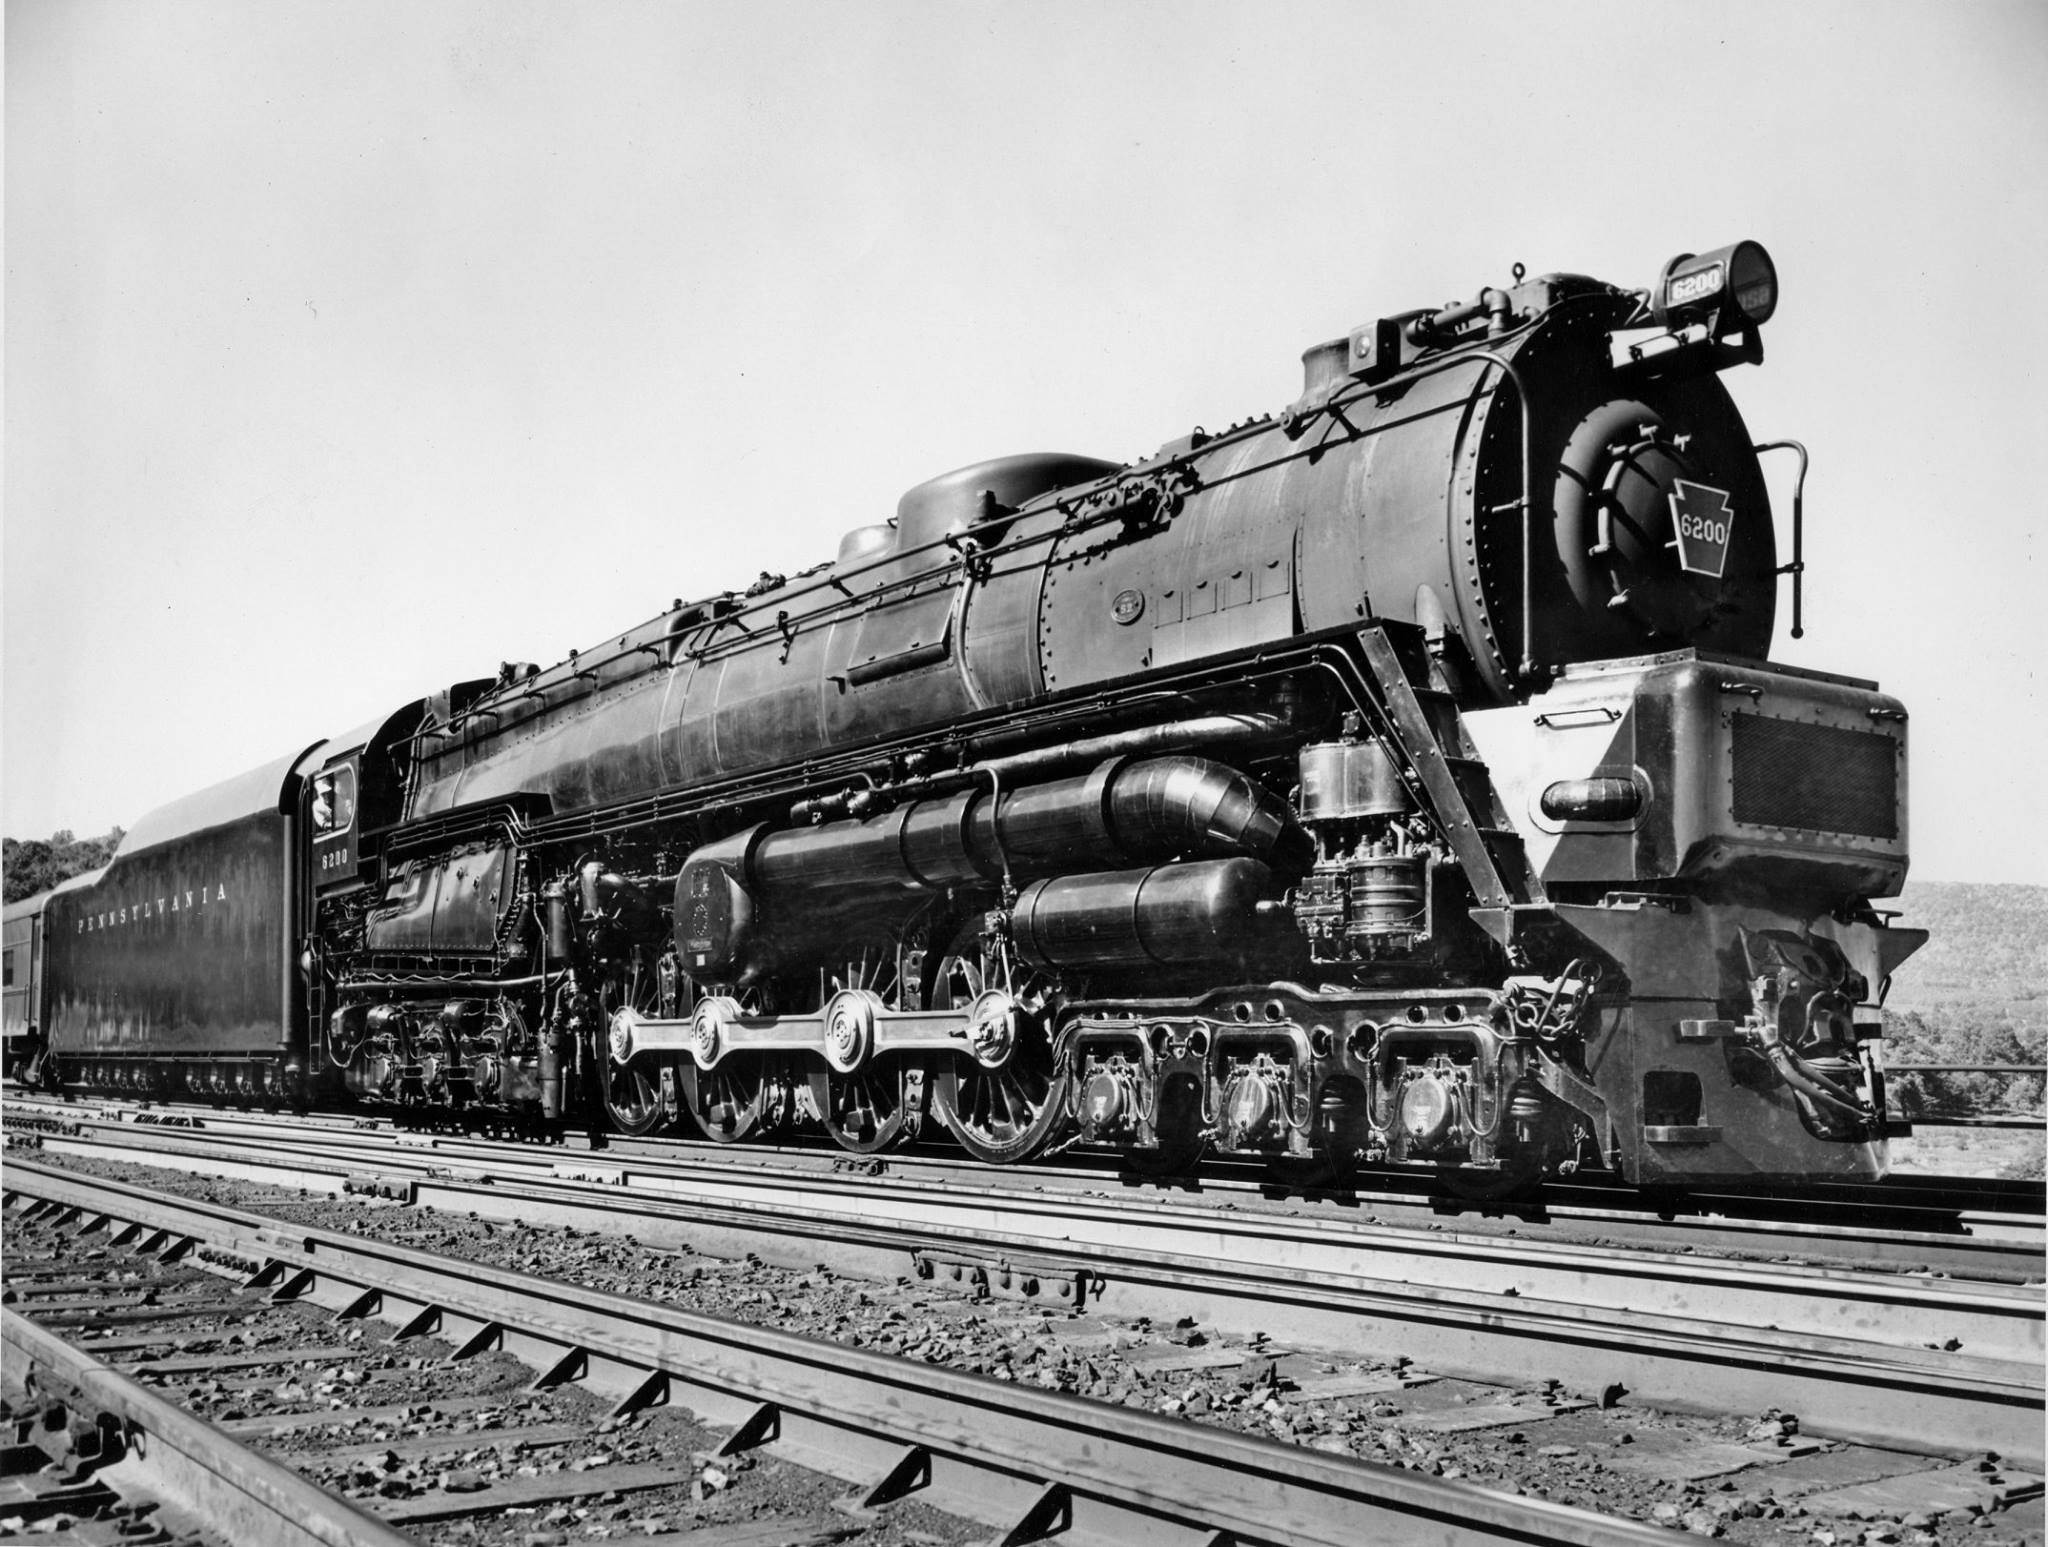 Pennsylvania Railroad class S2